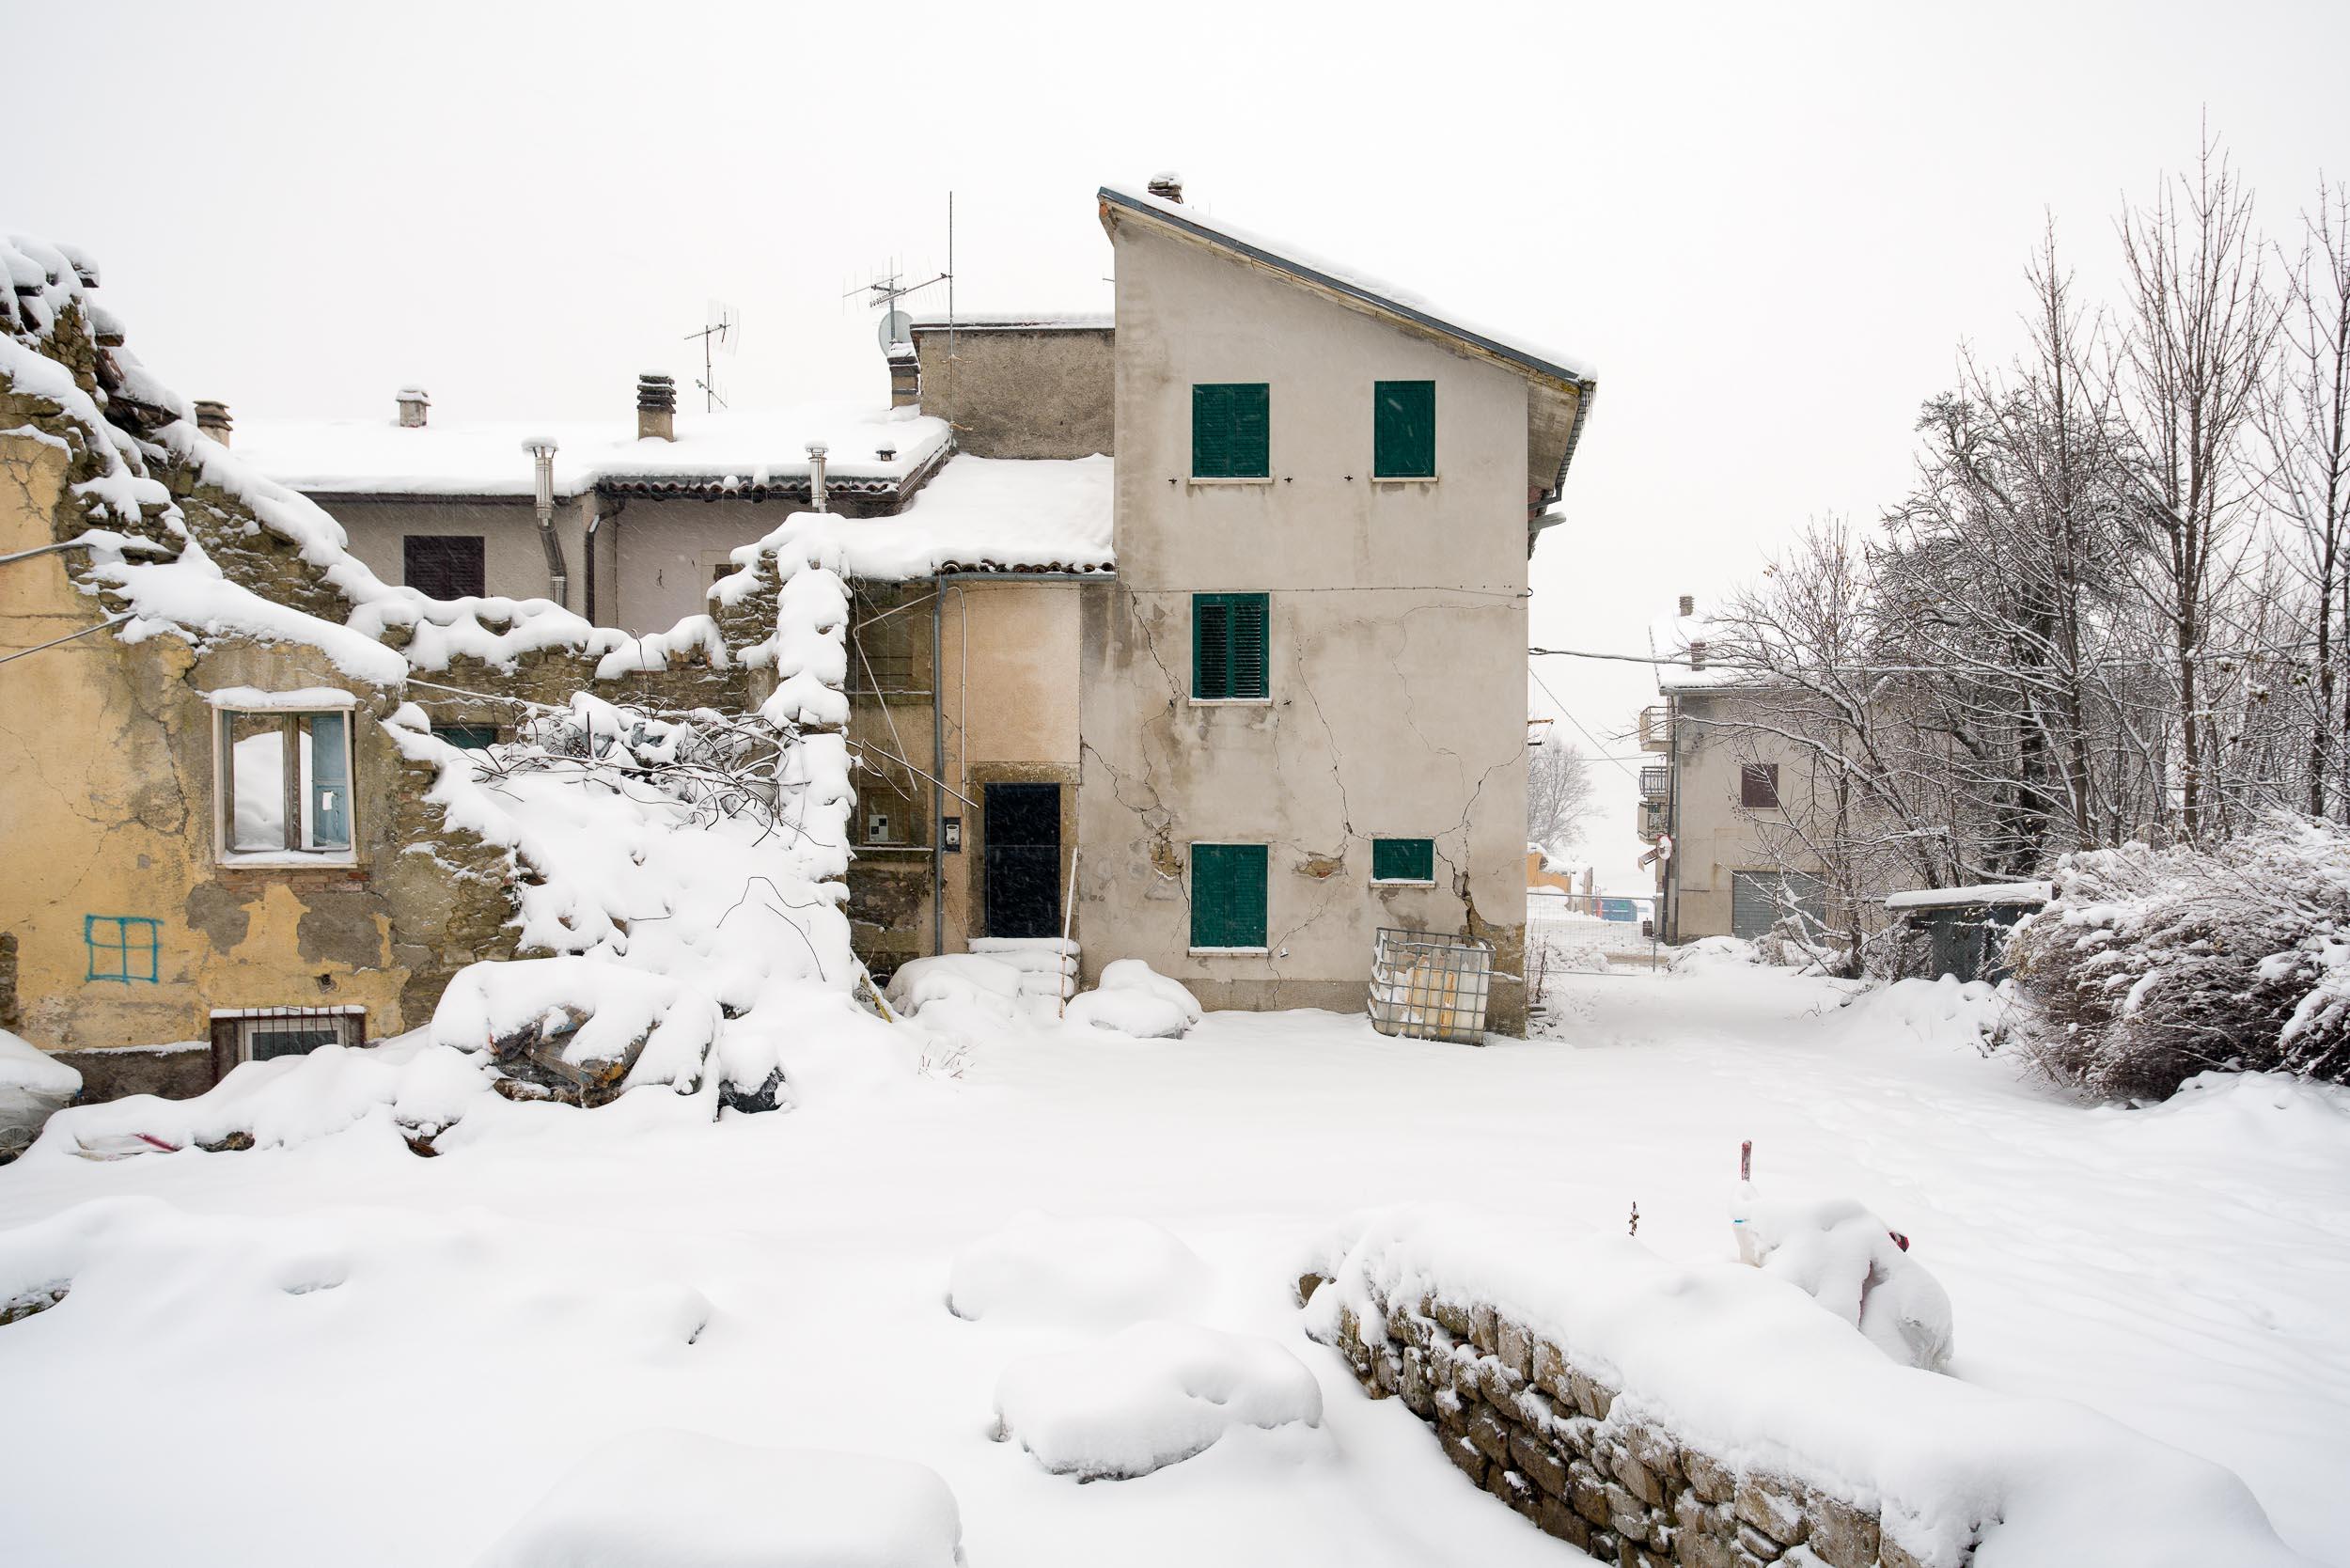 003-Campotosto_GAB3254M-Gabriele Lungarella.jpg